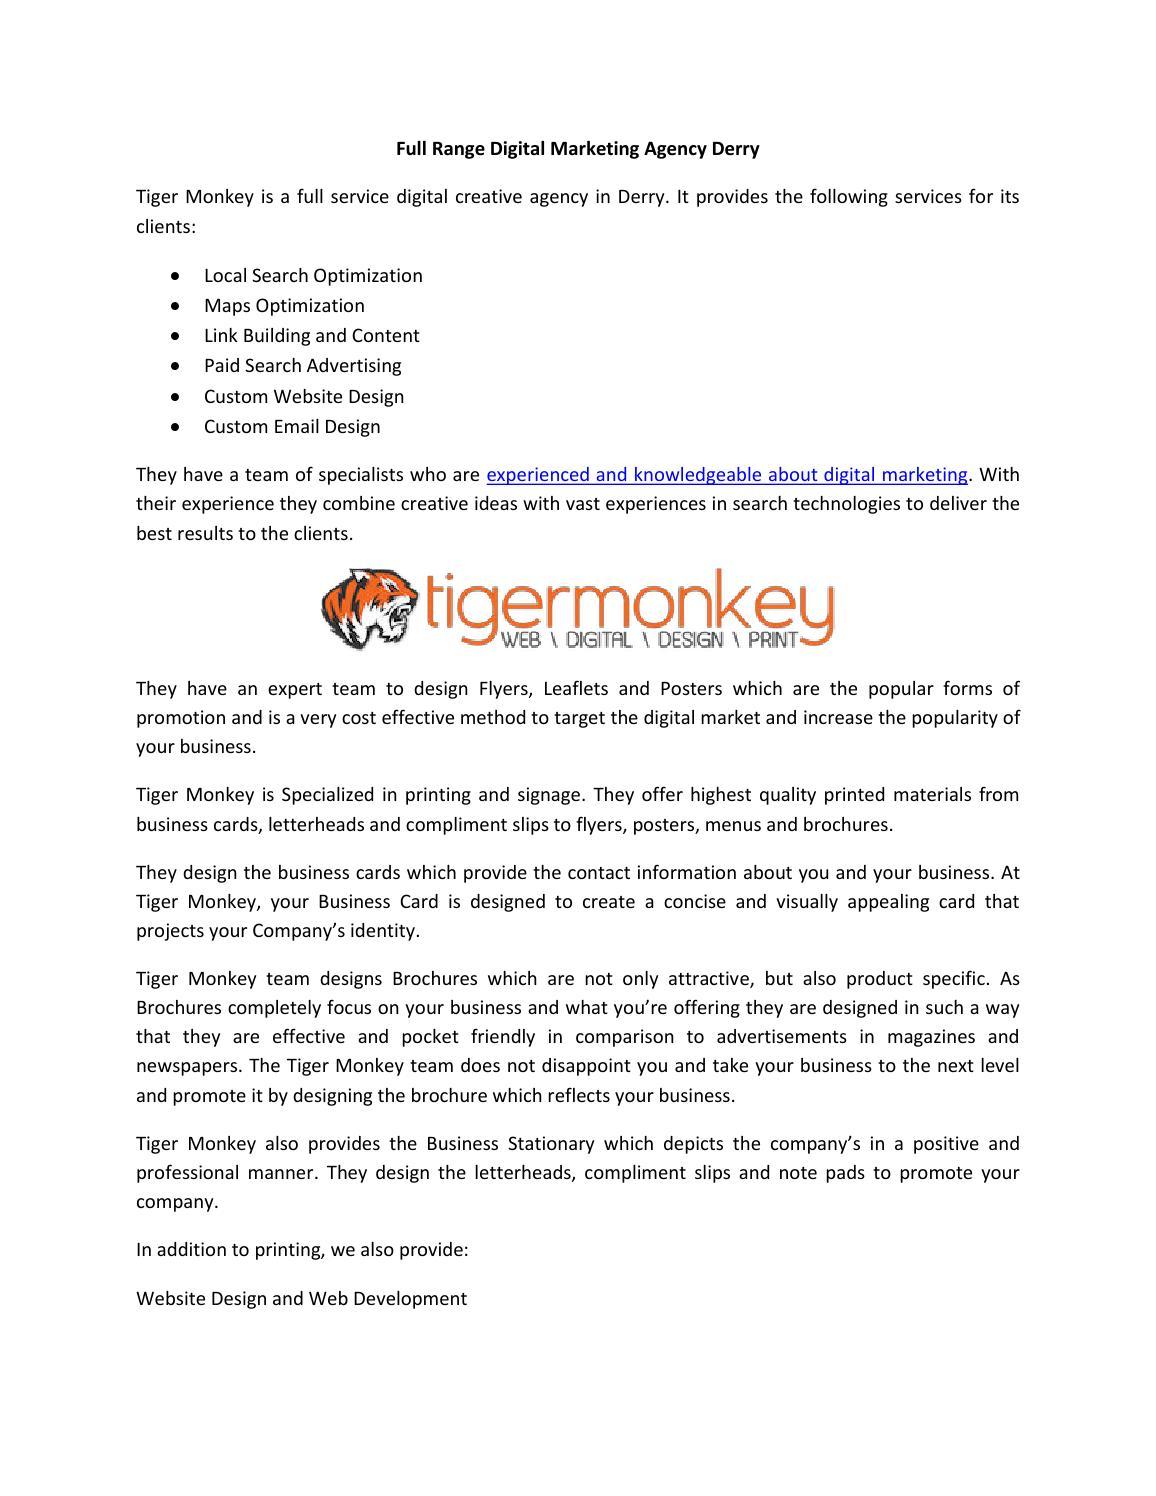 Full range digital marketing agency derry by stevenlewis1 issuu colourmoves